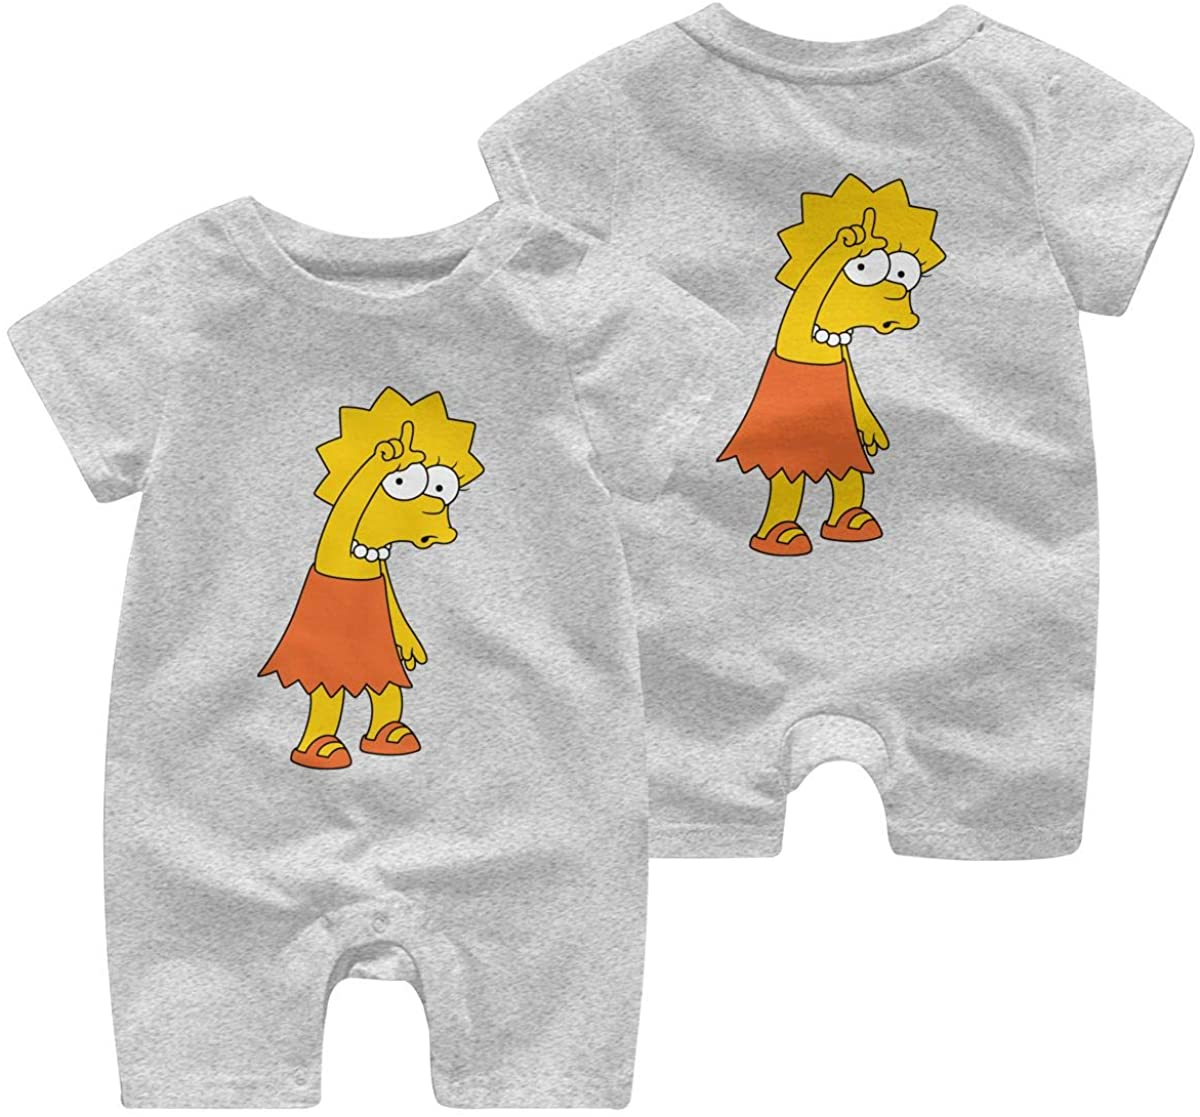 The Simpsons Krusty The Clown Comfortable Baby Short Sleeve Jumpsuit Kid Baby Pajama Sleeper Cotton Romper